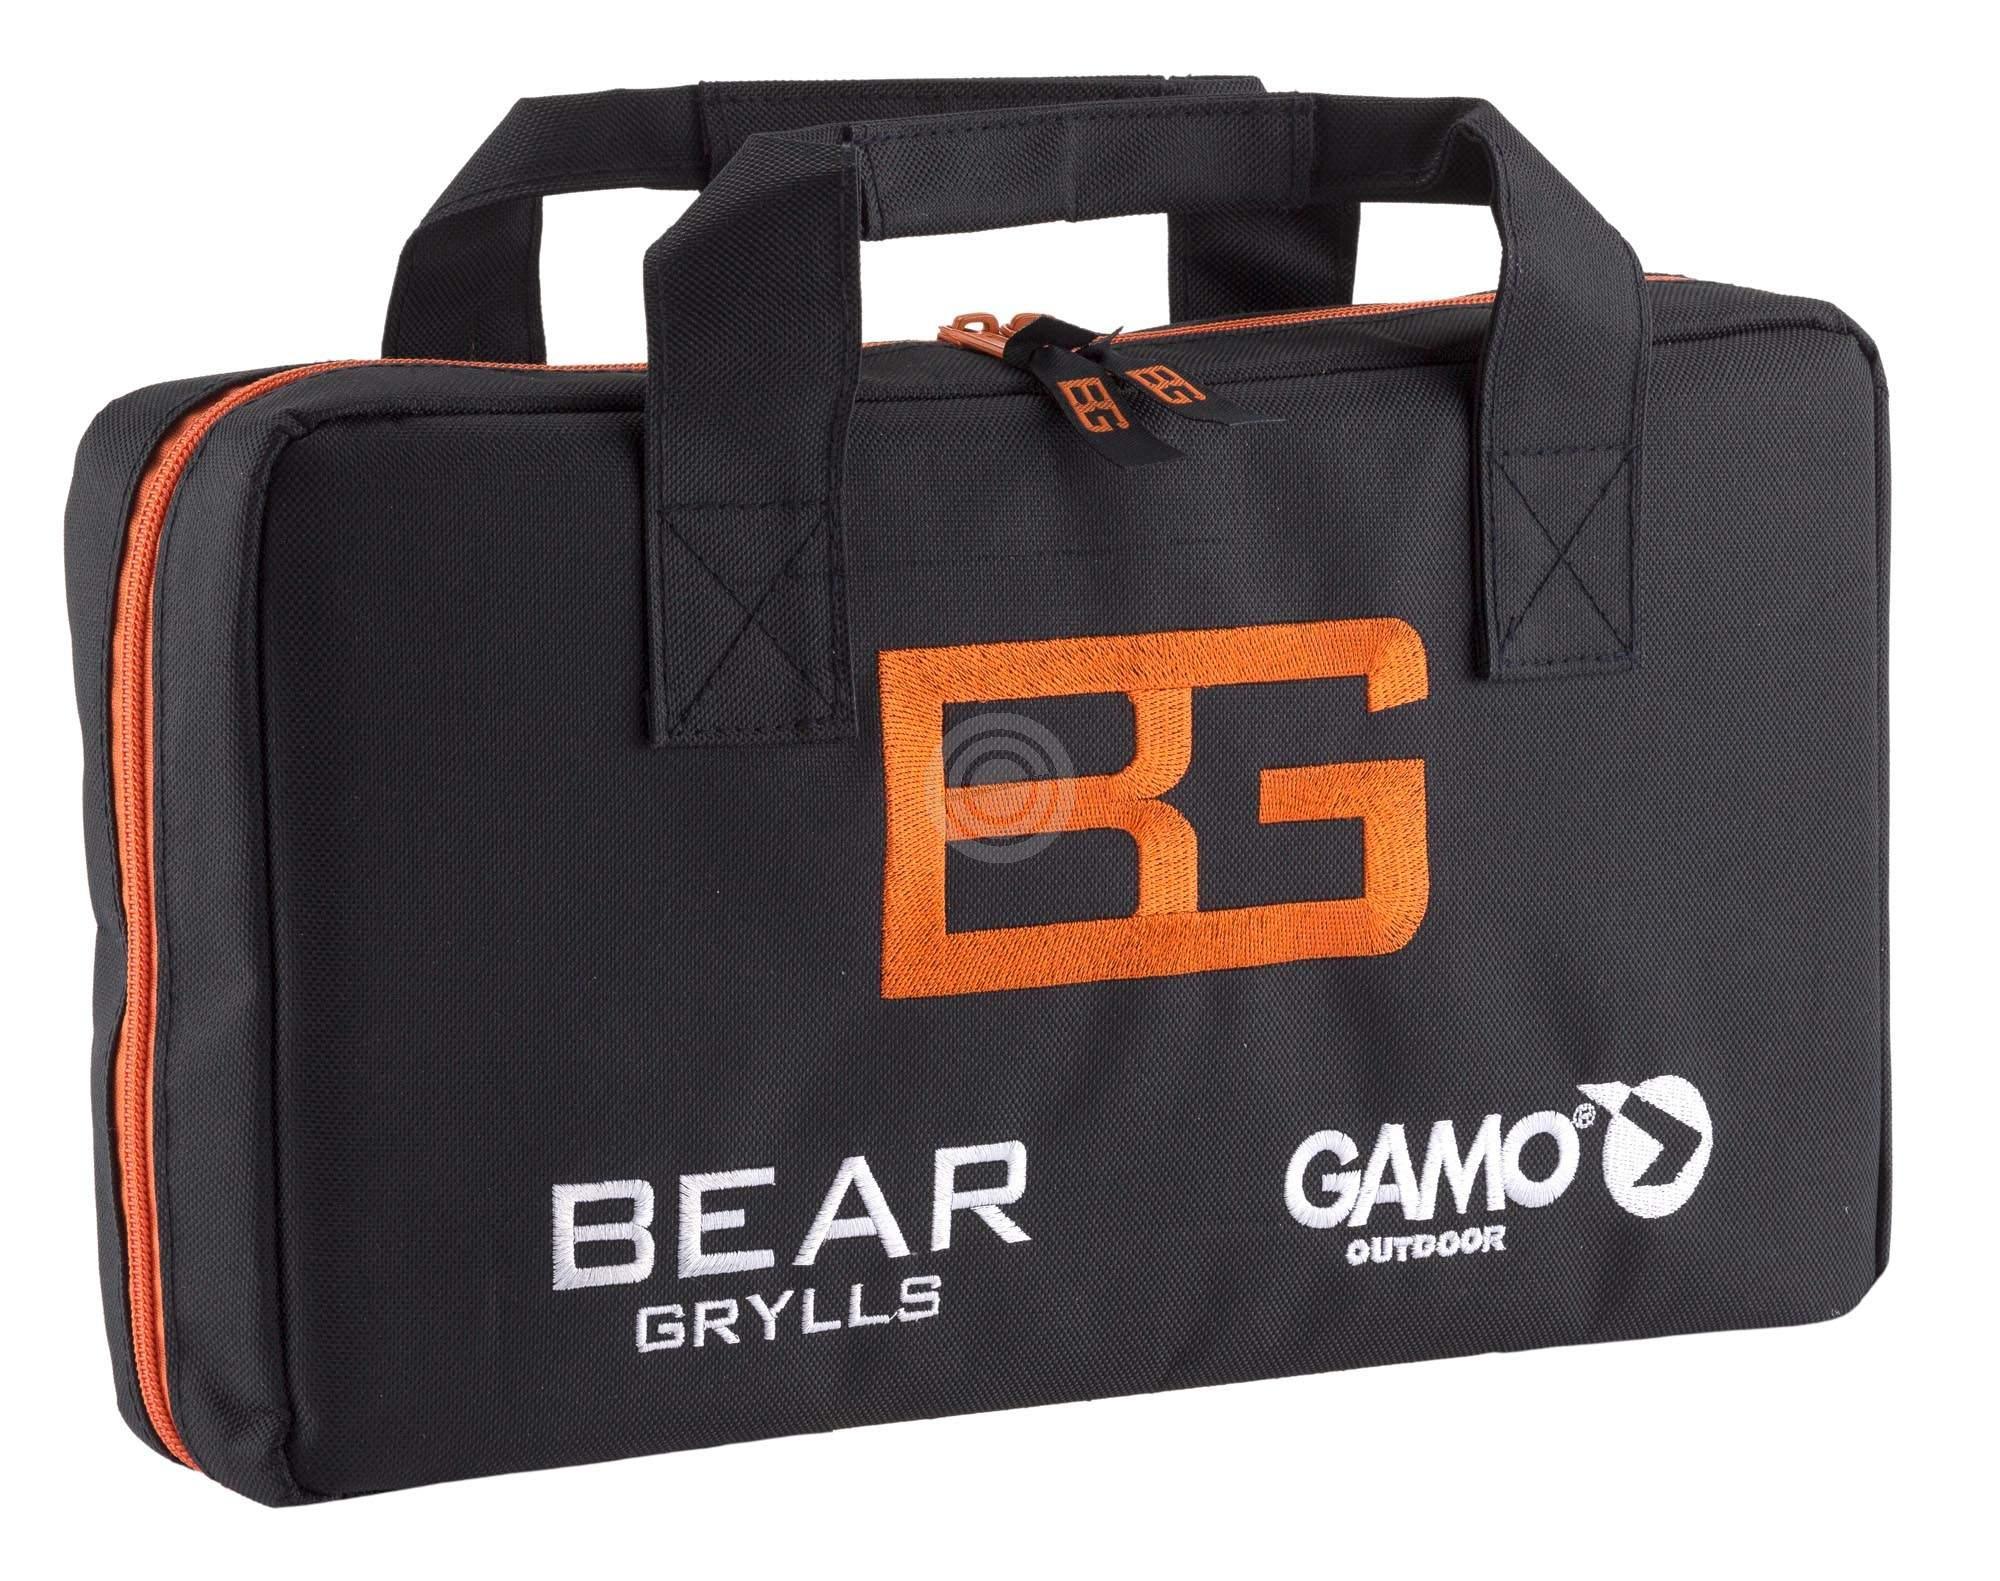 Housse pistolet GAMO Bear GRYLLS